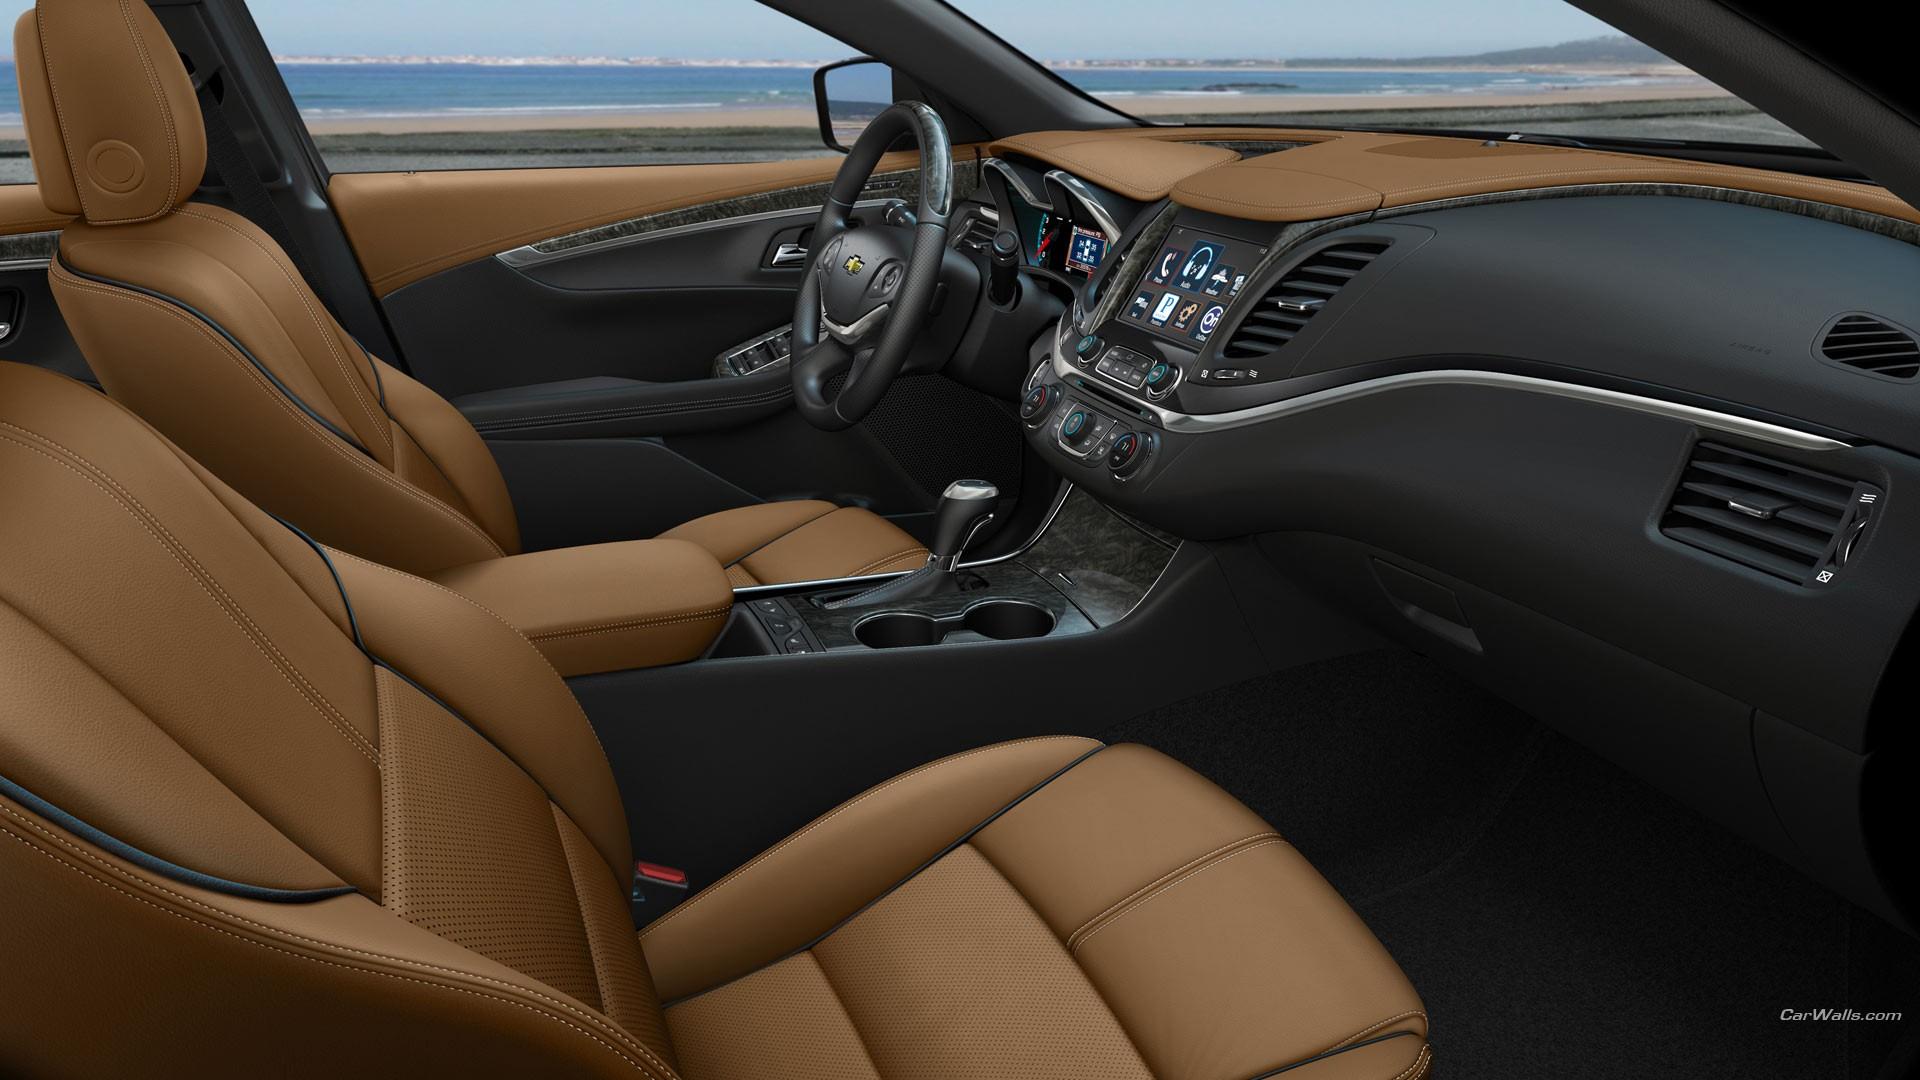 Hintergrundbilder Fahrzeug Auto Innenraum Chevrolet Impala